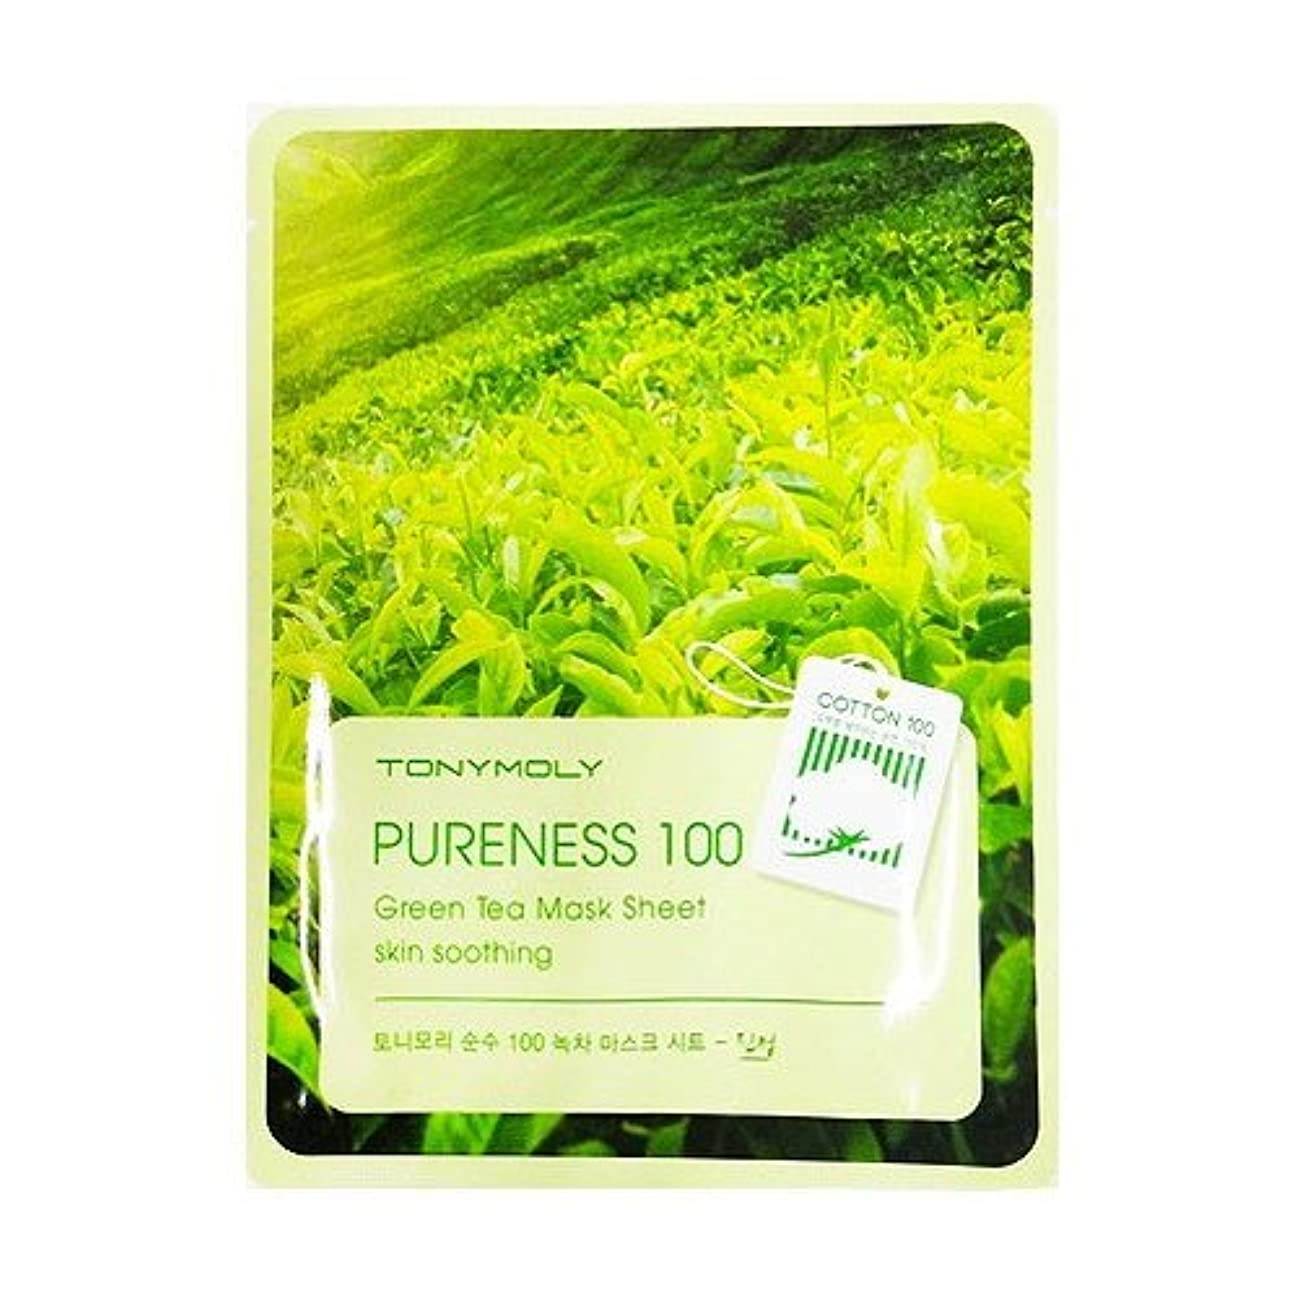 (3 Pack) TONYMOLY Pureness 100 Green Tea Mask Sheet Skin Soothing (並行輸入品)